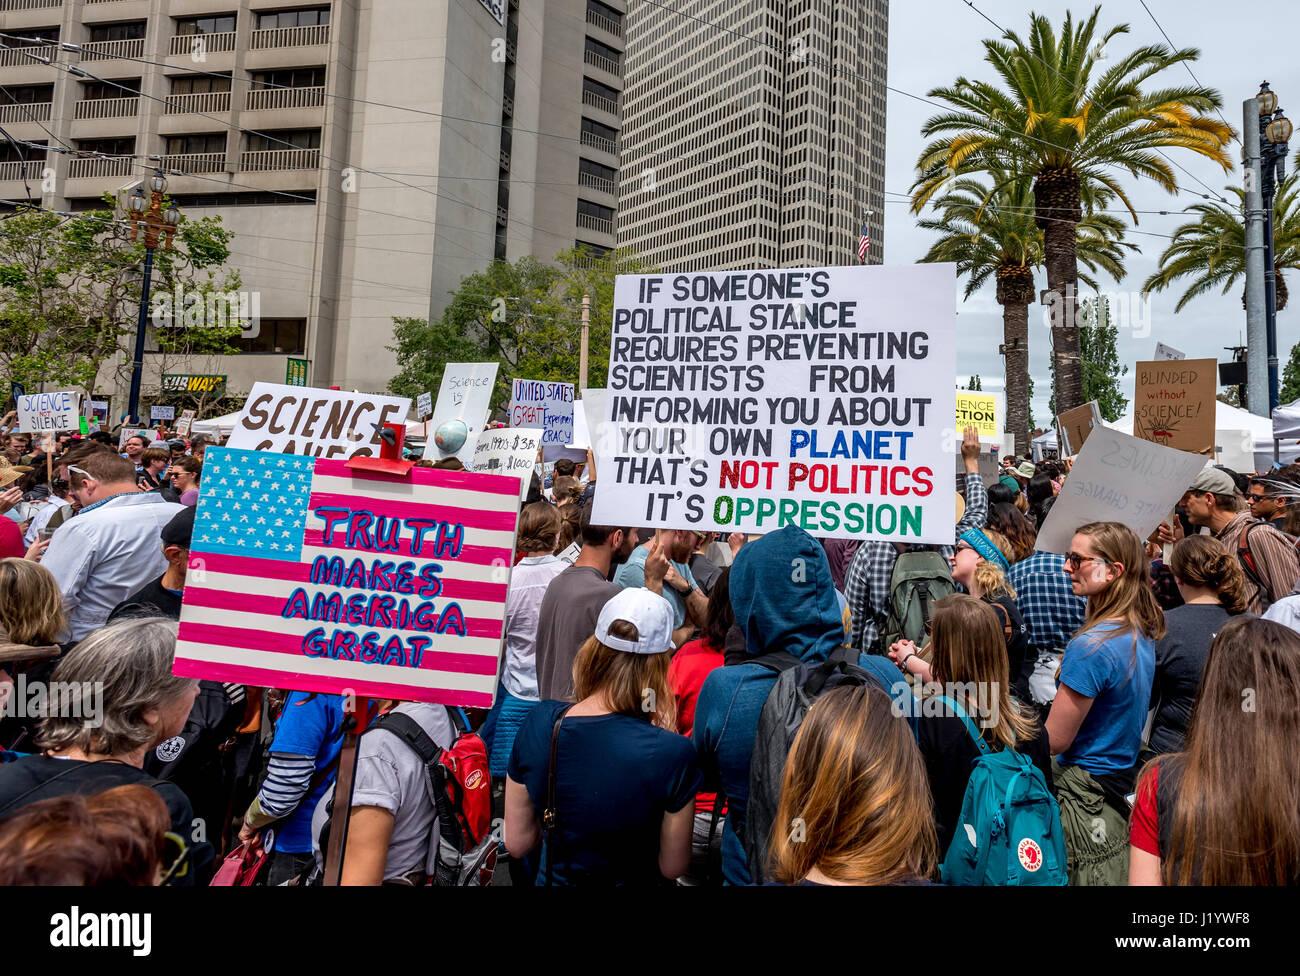 San Francisco, California, USA. 22nd April, 2017. The crowd swells beyond Justin Herman Plaza where an Earth Day - Stock Image